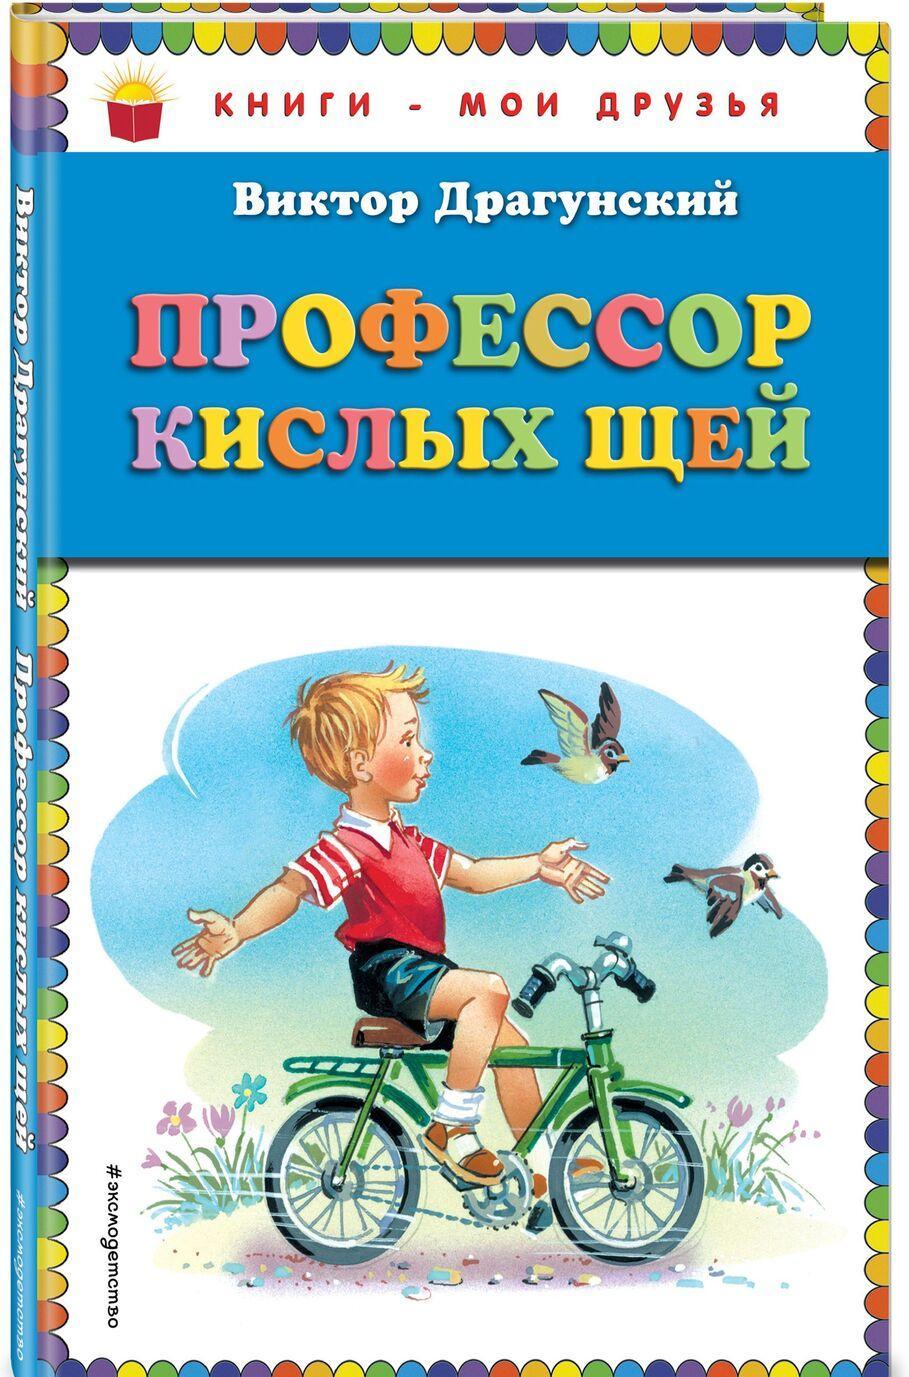 Professor kislykh schej (il. V. Kanivtsa)